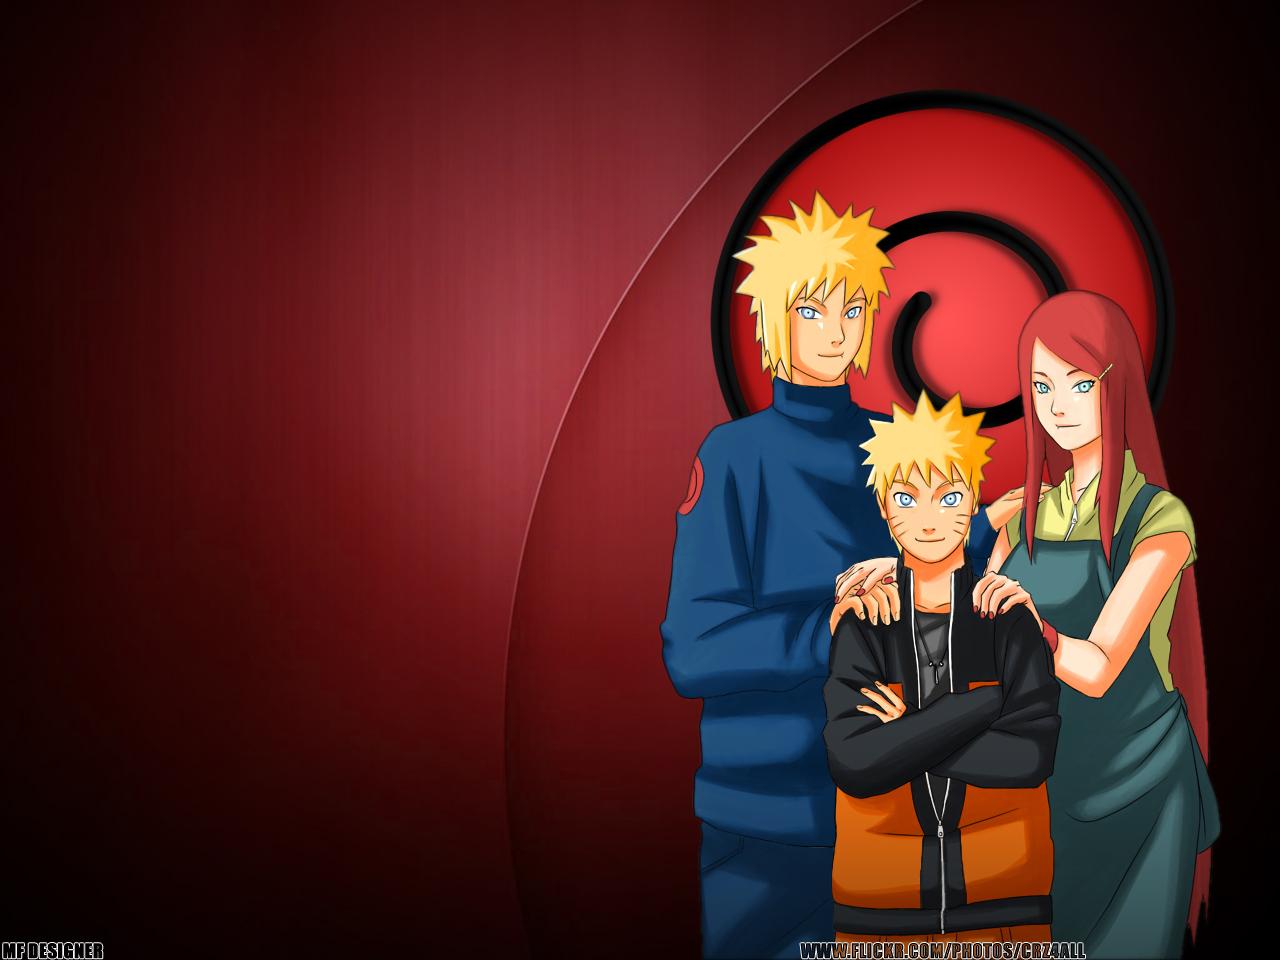 Top Wallpaper Naruto Dbz - OcLDB0  2018_943261.jpg